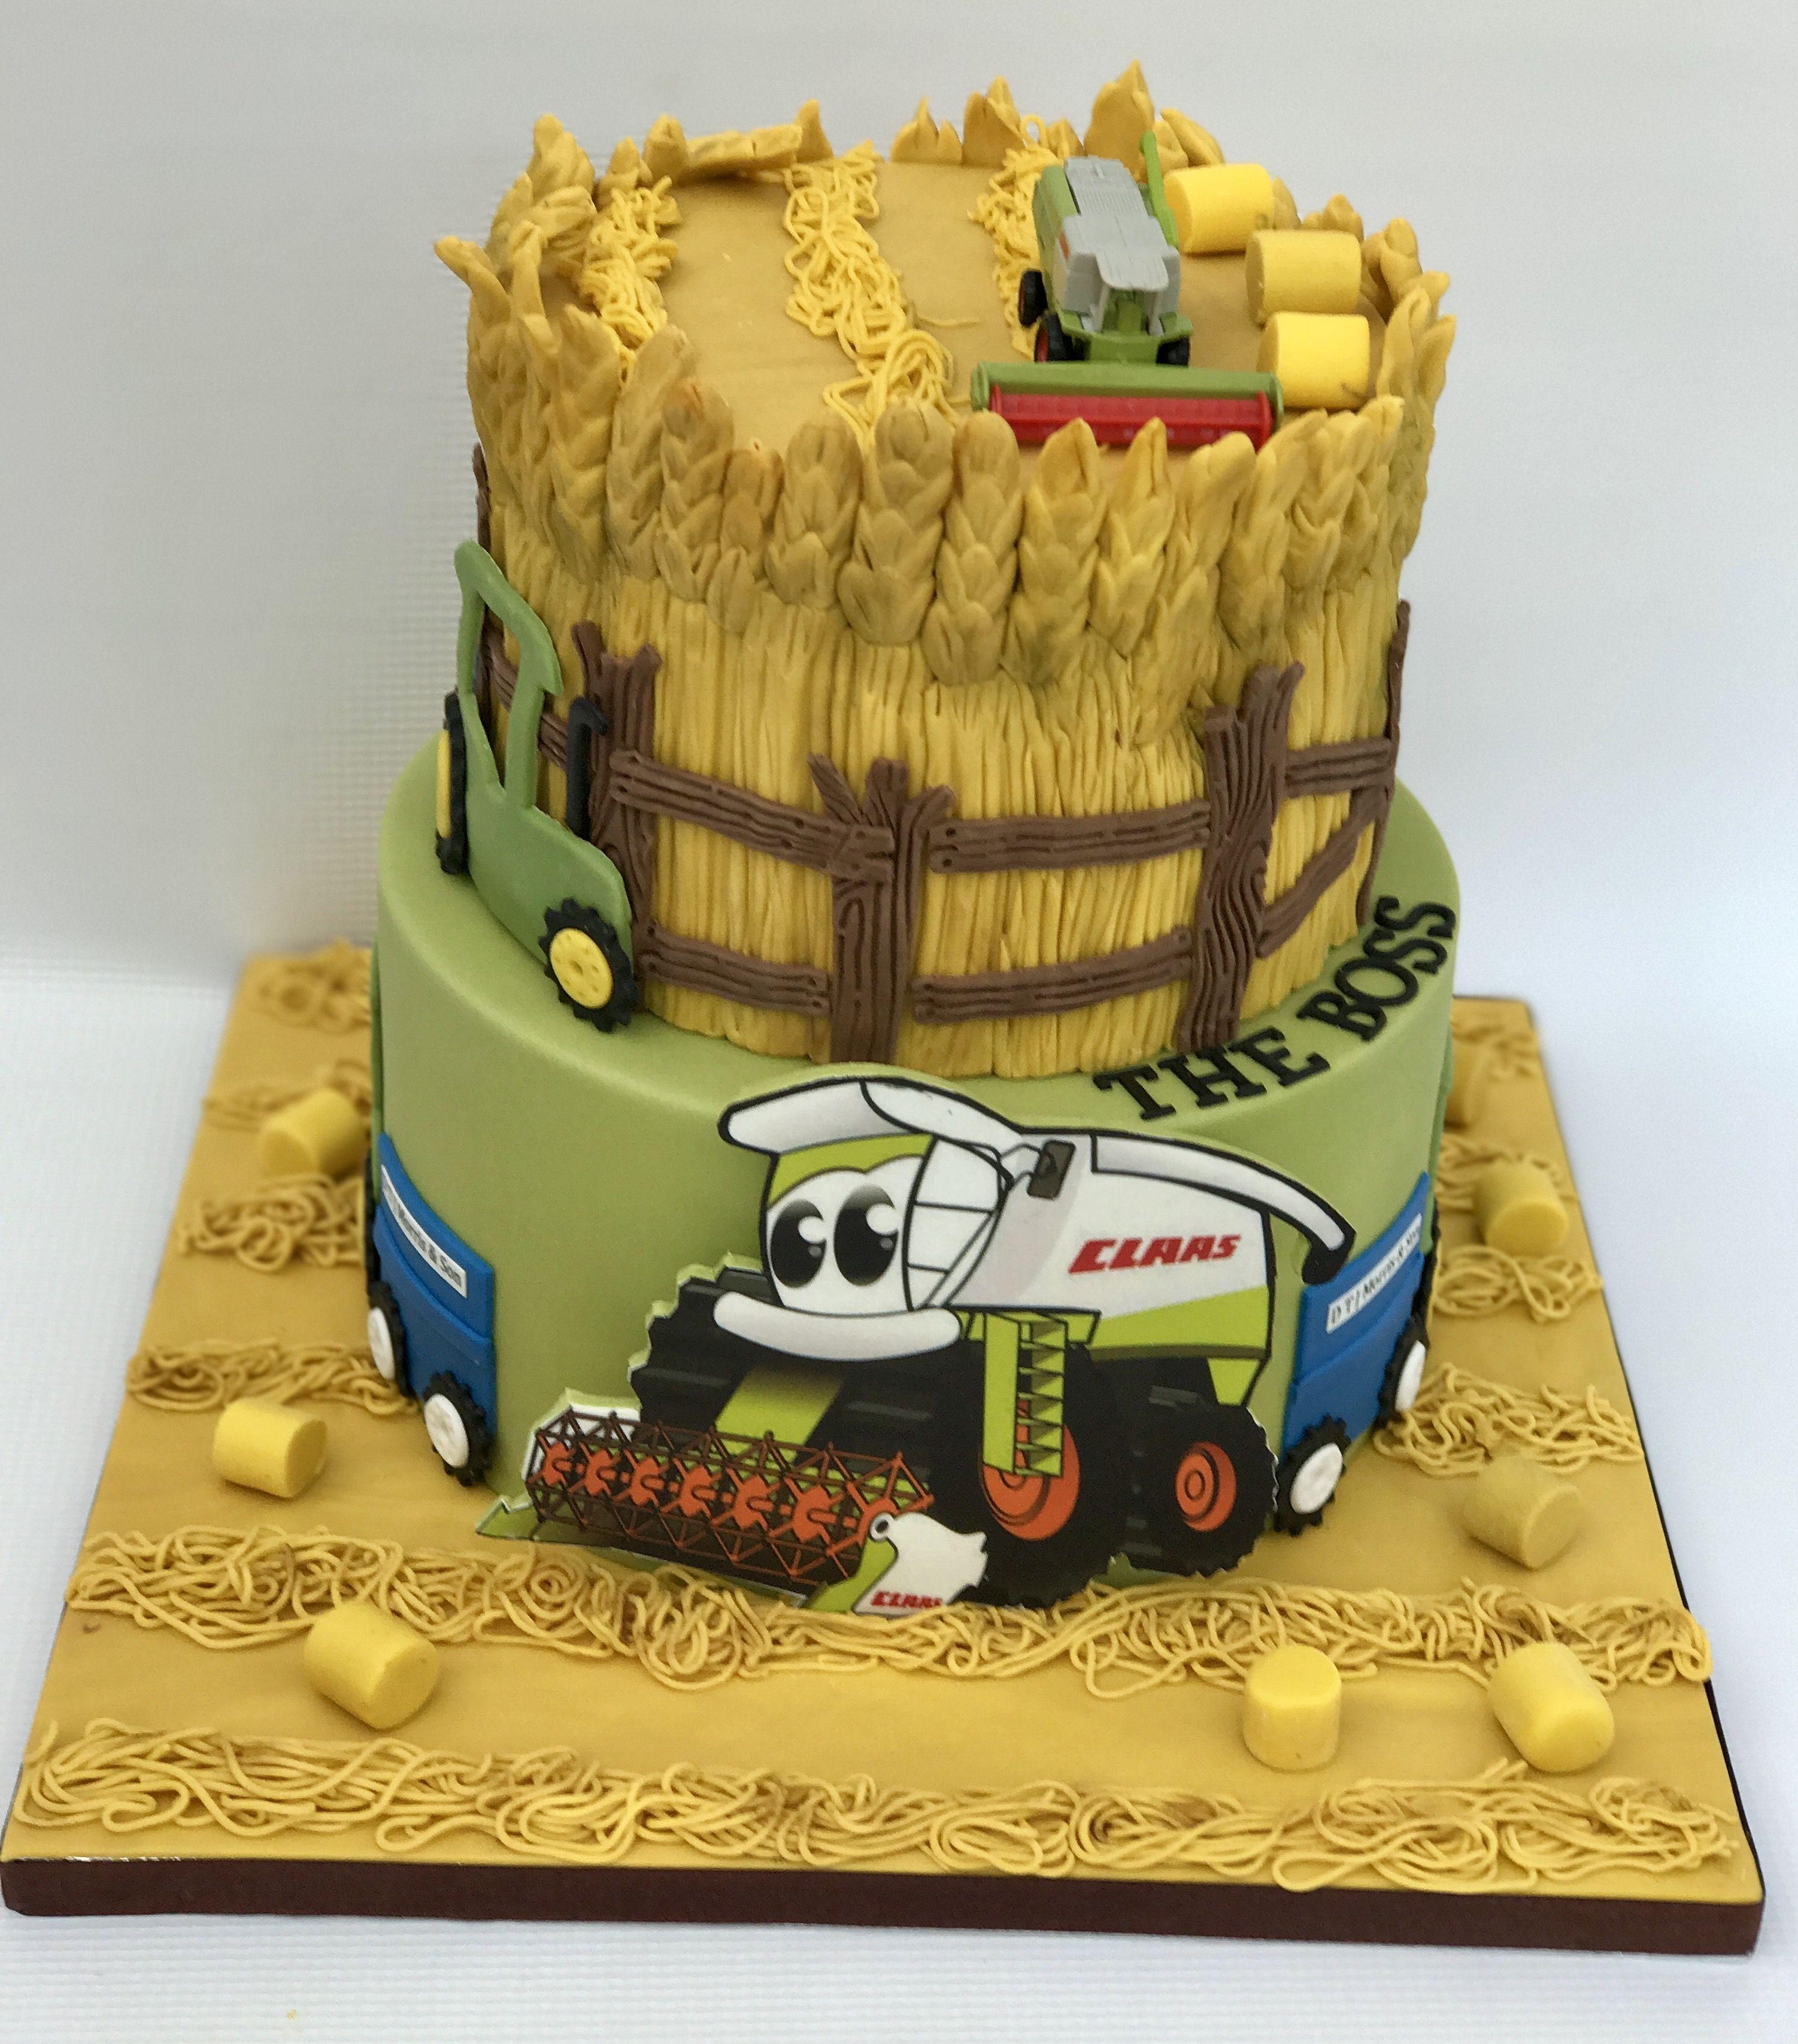 Harvesting Cake